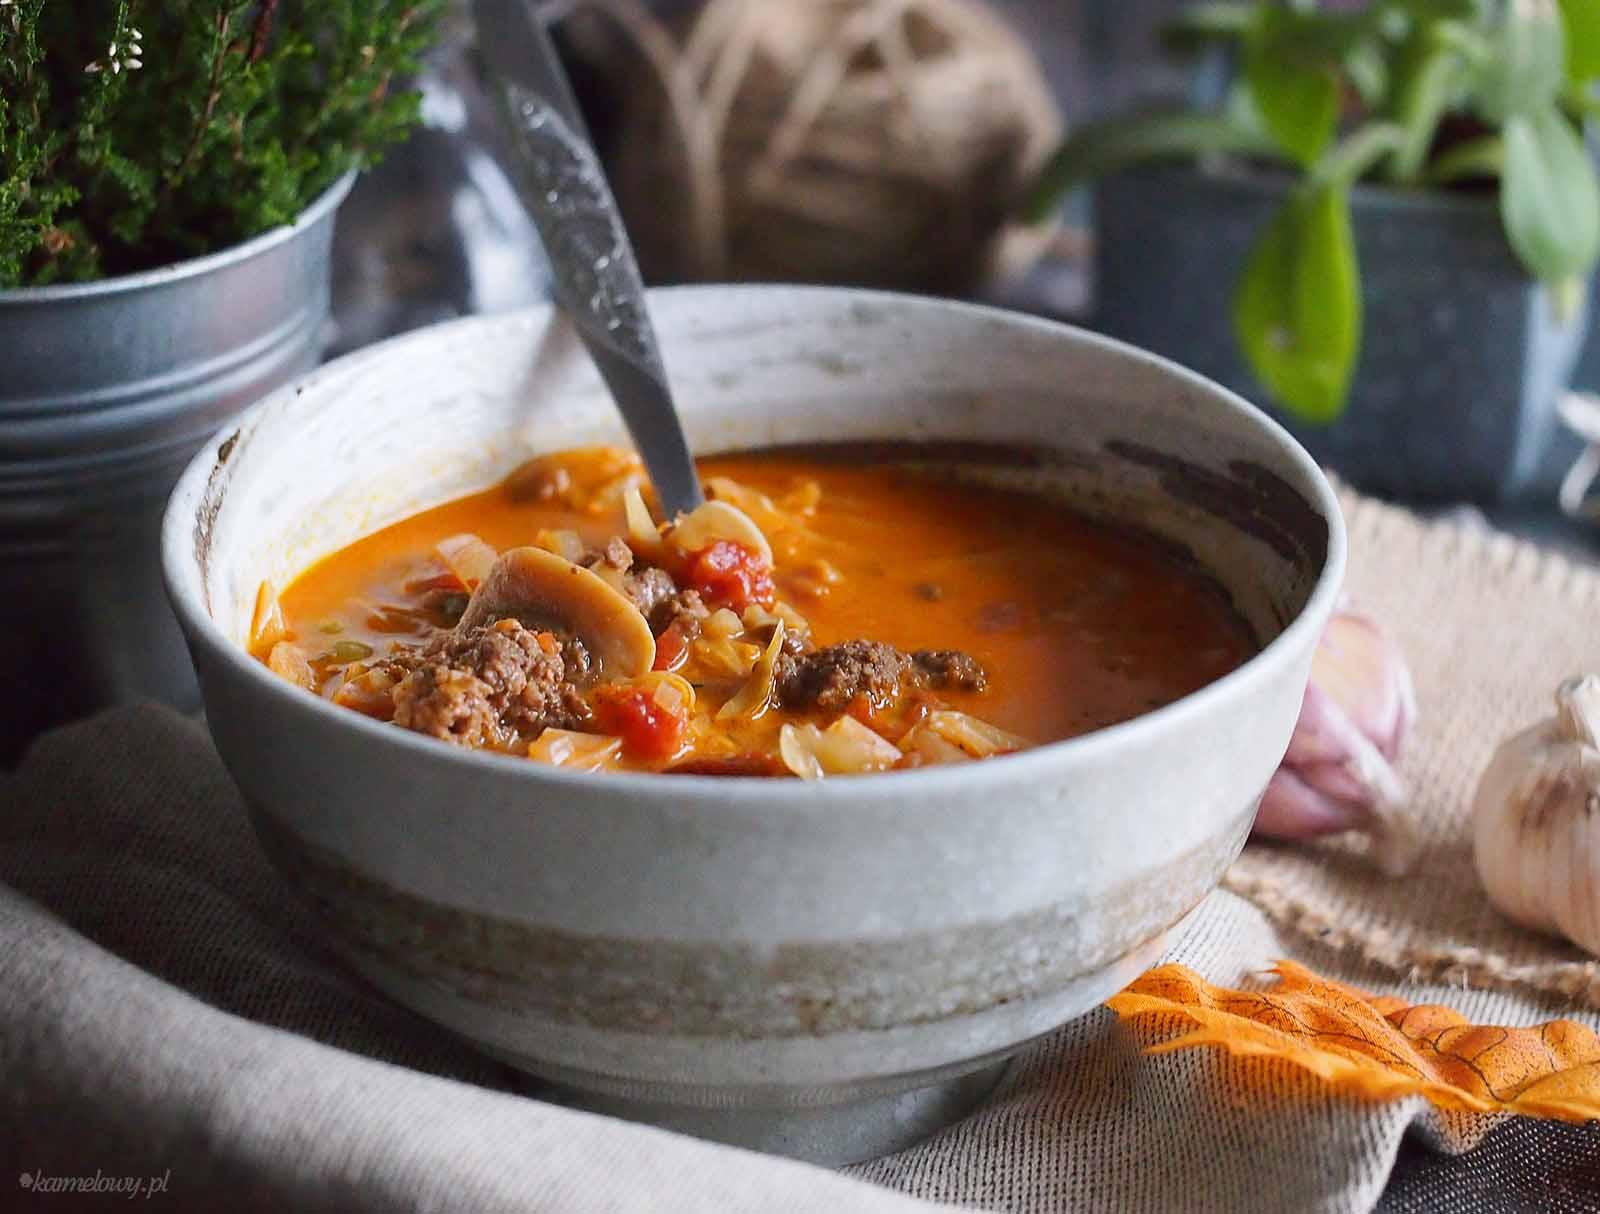 Sycacy-kapusniak-z-miesem-i-grzybami-Cabbage-soup-with-meat-and-mushrooms